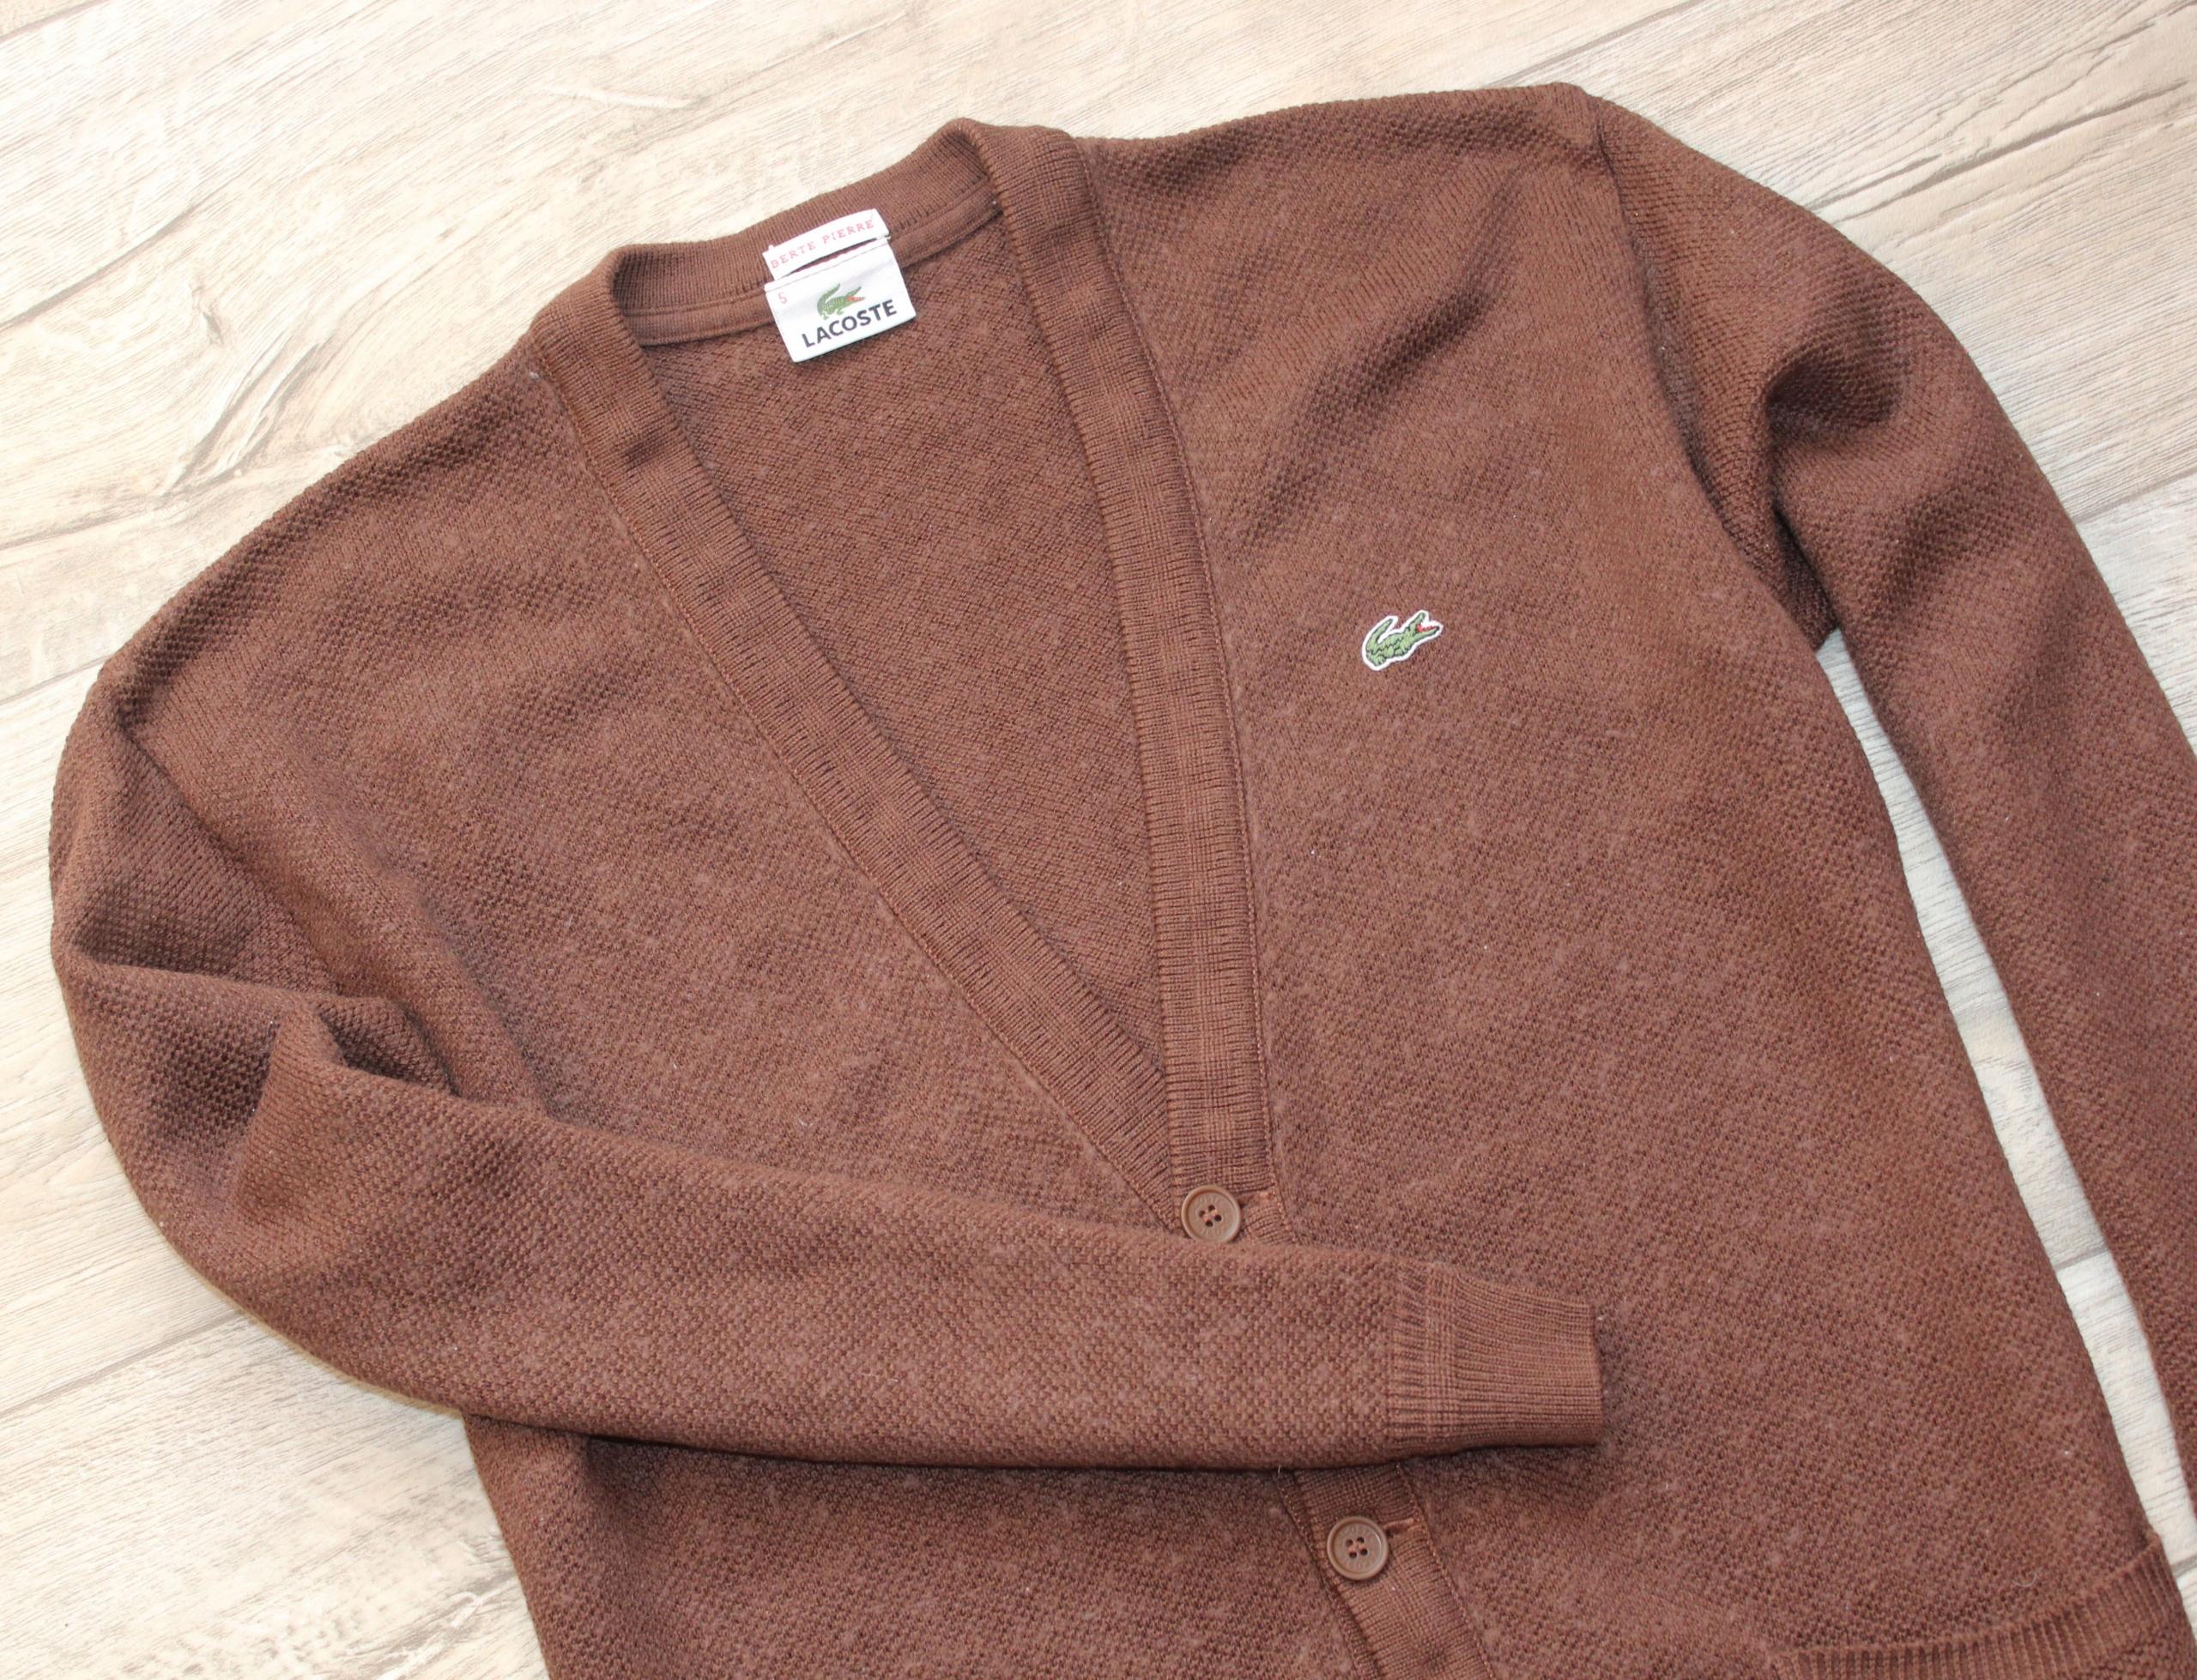 Męski Sweter Lacoste L 5 woolmark bdb wełna